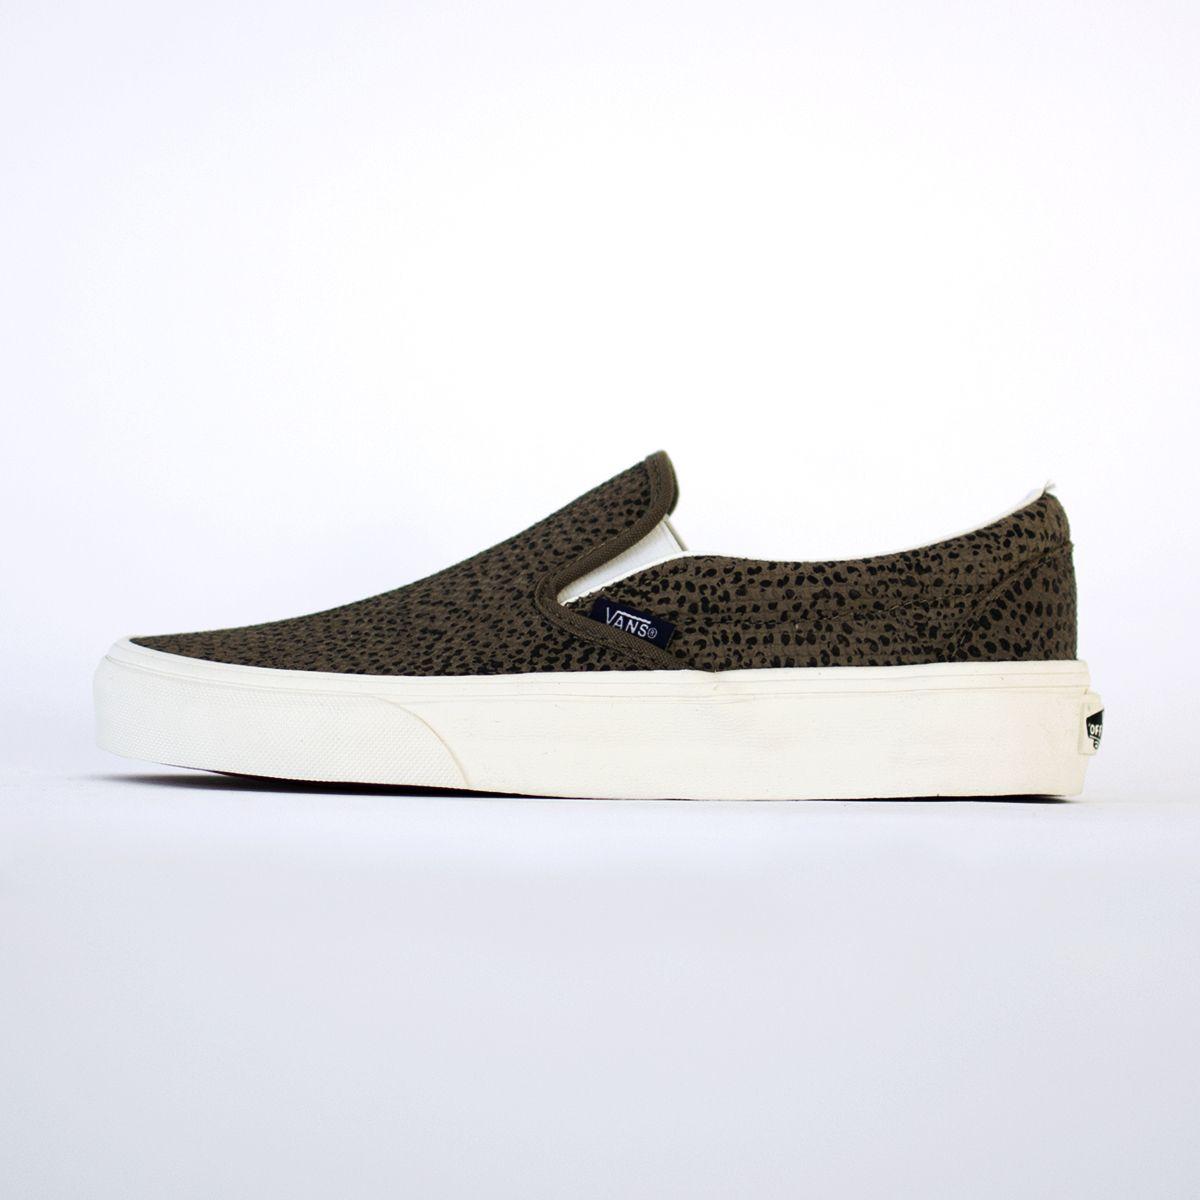 72df1a5ff2eb VANS - 0MEGYM CLASSIC SLIP ON - cheetah suede/black/tan sneakers - http